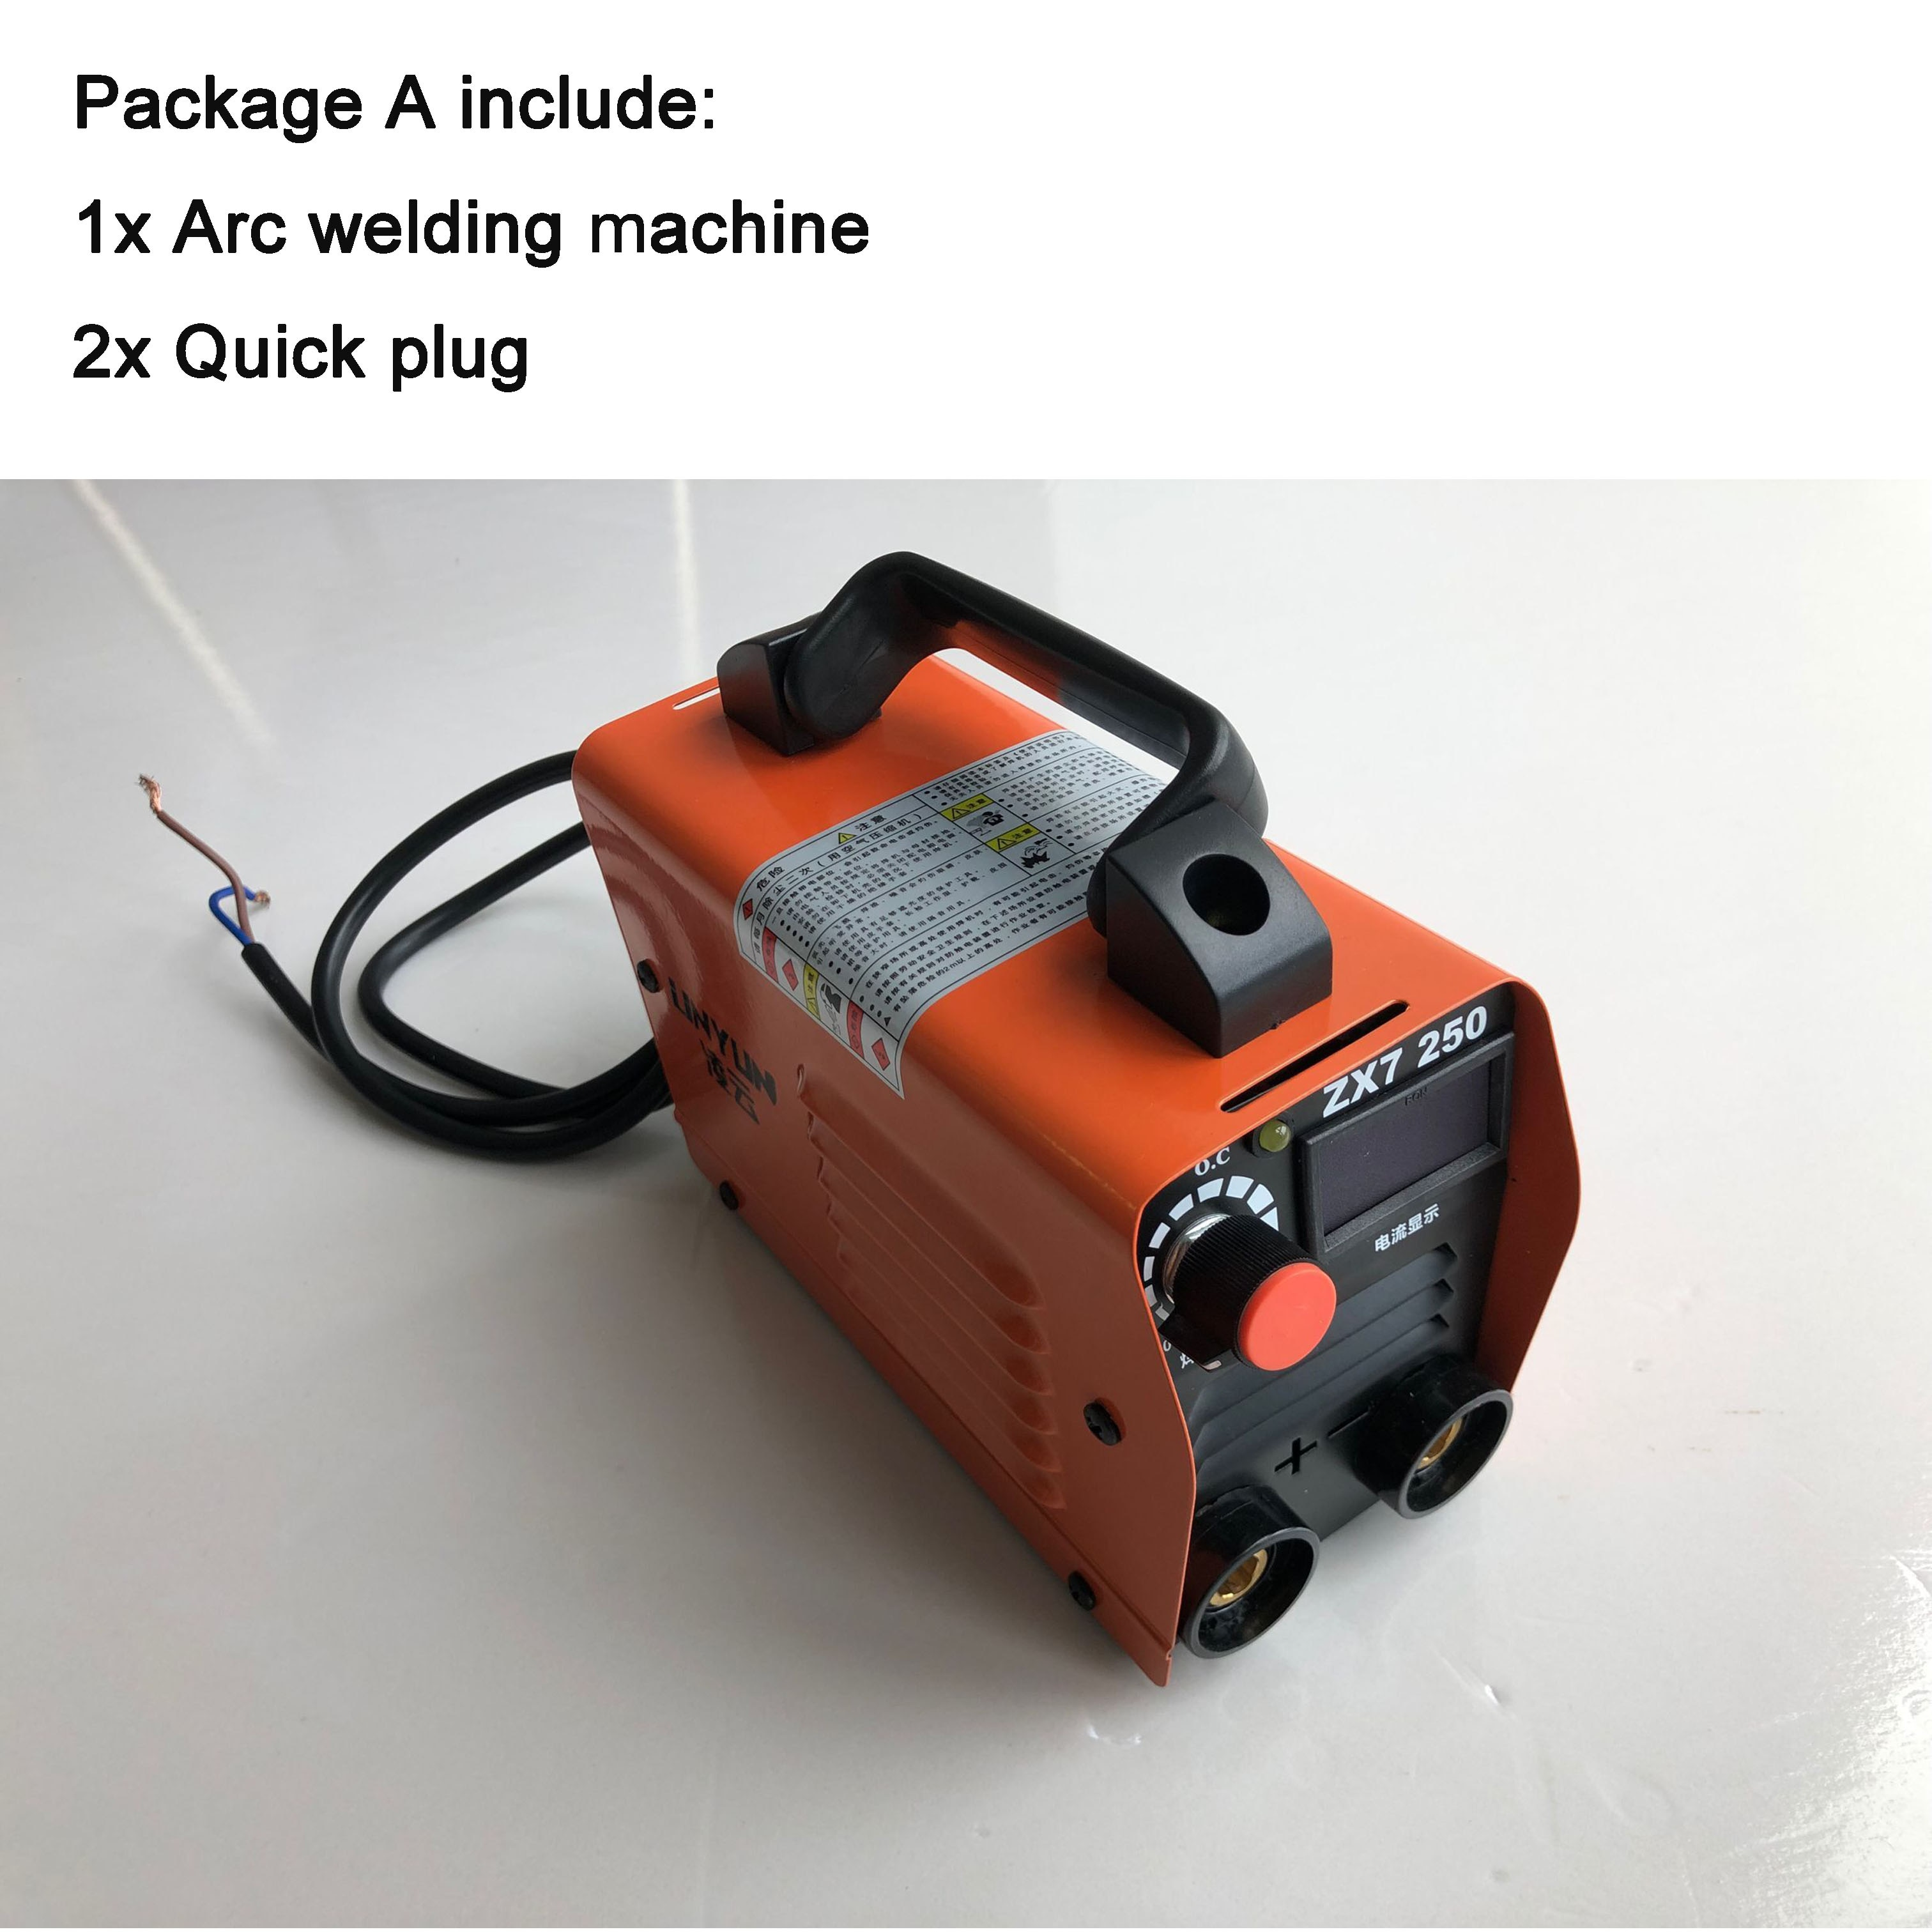 RU delivery 250V Compact Mini MMA Welder Inverter ARC Welding Machine Stick Welder